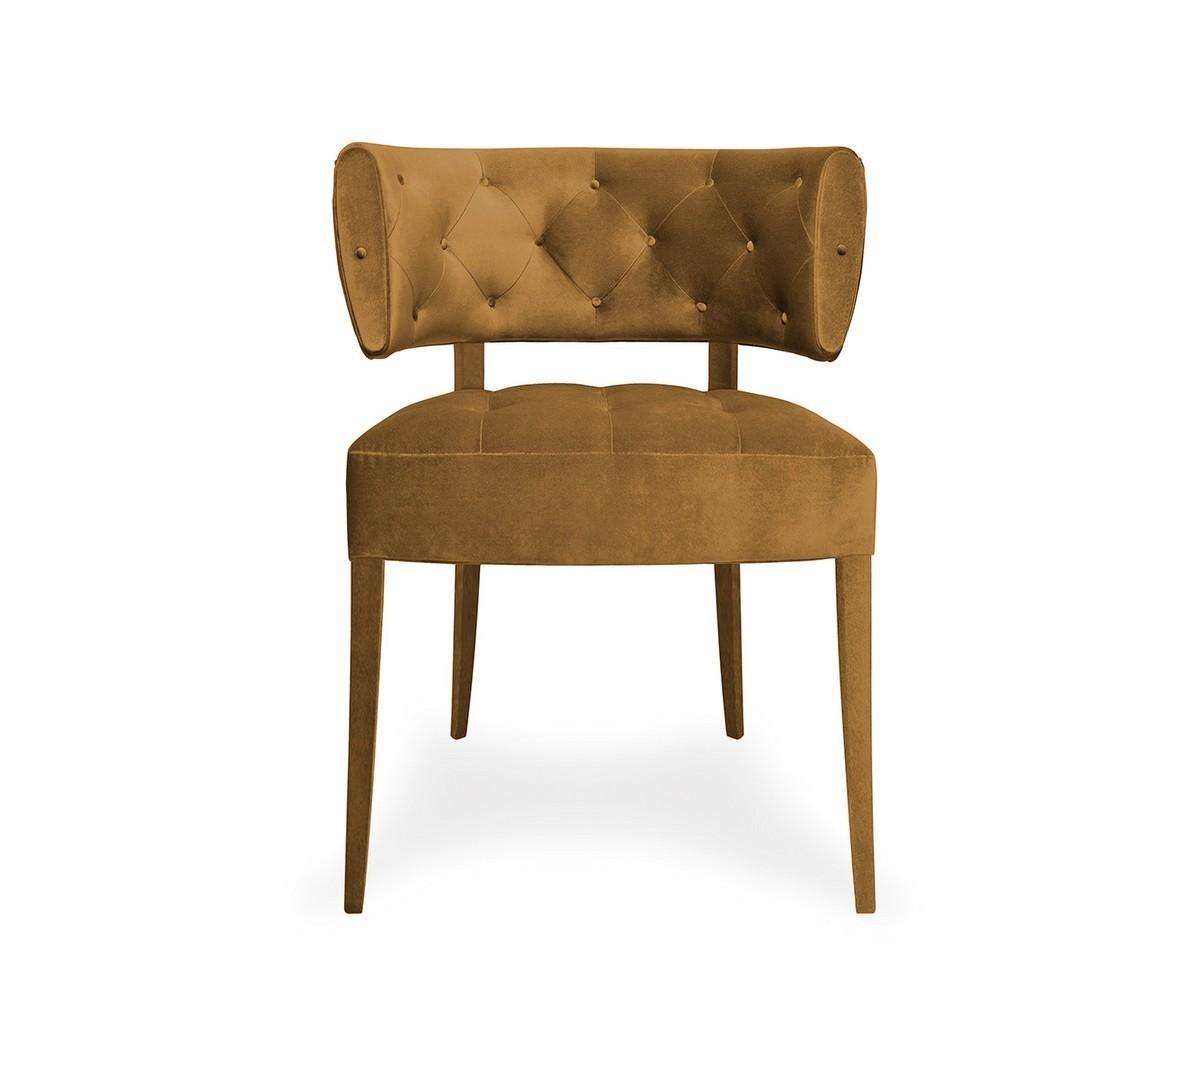 Top Minimalist Dining Chairs minimalist dining chairs Top Minimalist Dining Chairs zulu2 2